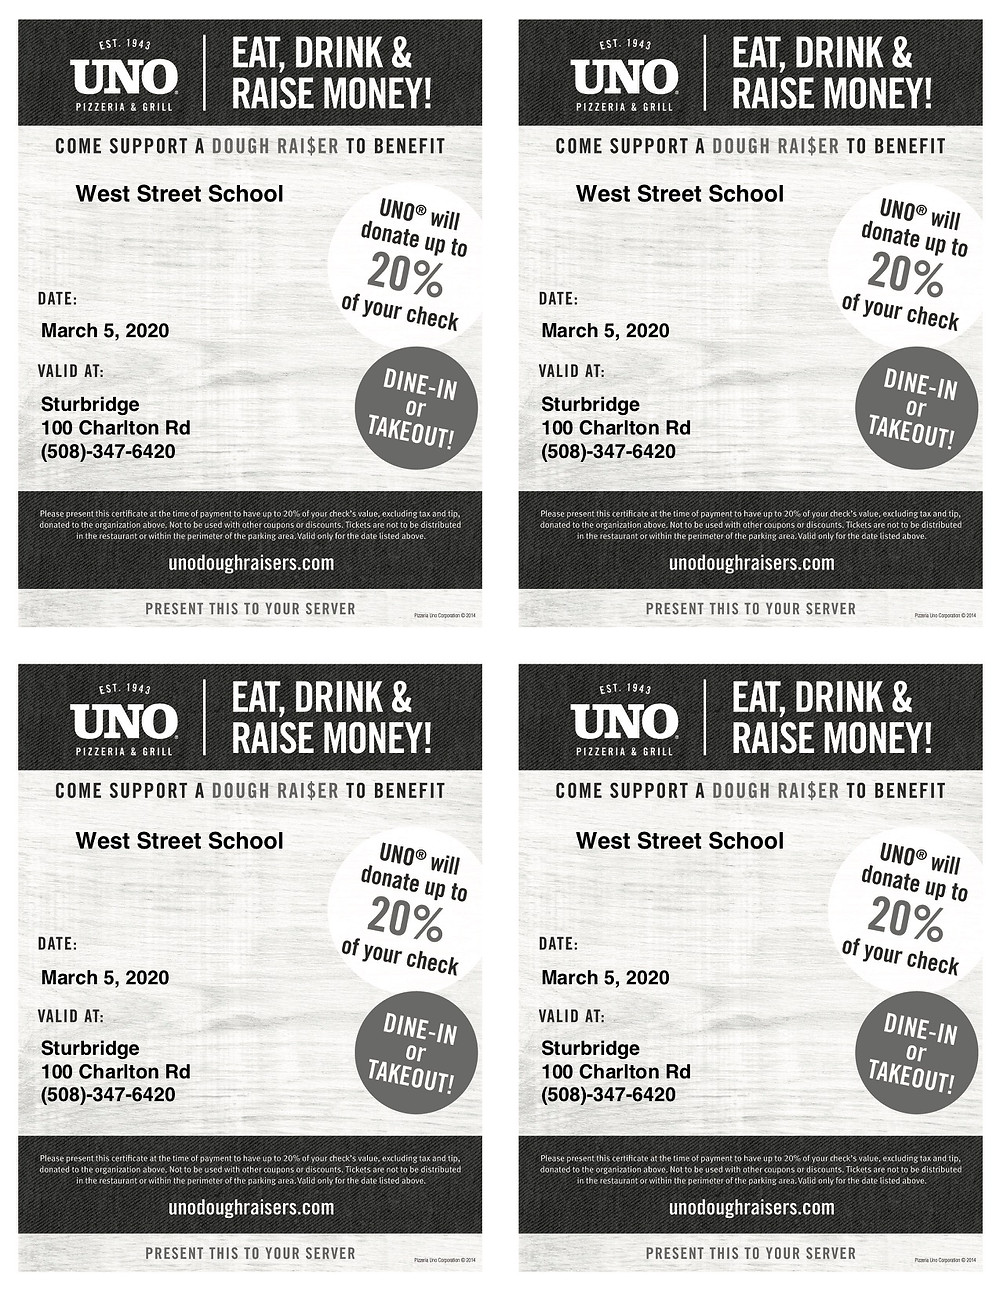 Flyer for the Pizzeria Uno fundraiser for West Street School's PBIS program